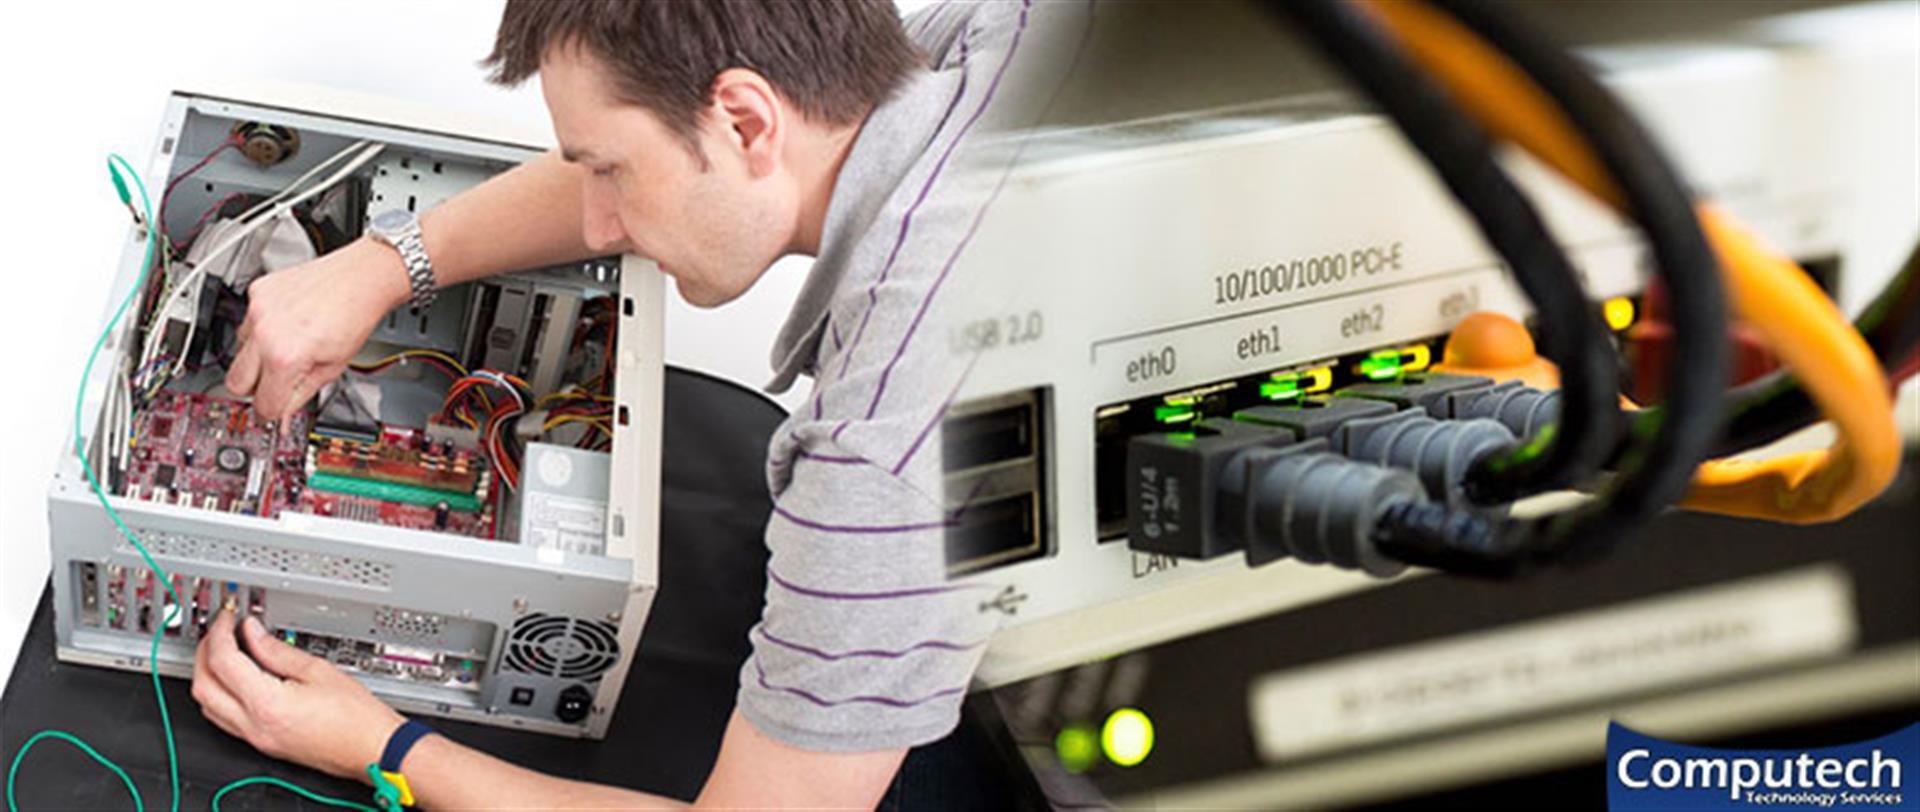 Foley Alabama On Site Computer PC & Printer Repair, Network, Telecom & Data Wiring Services